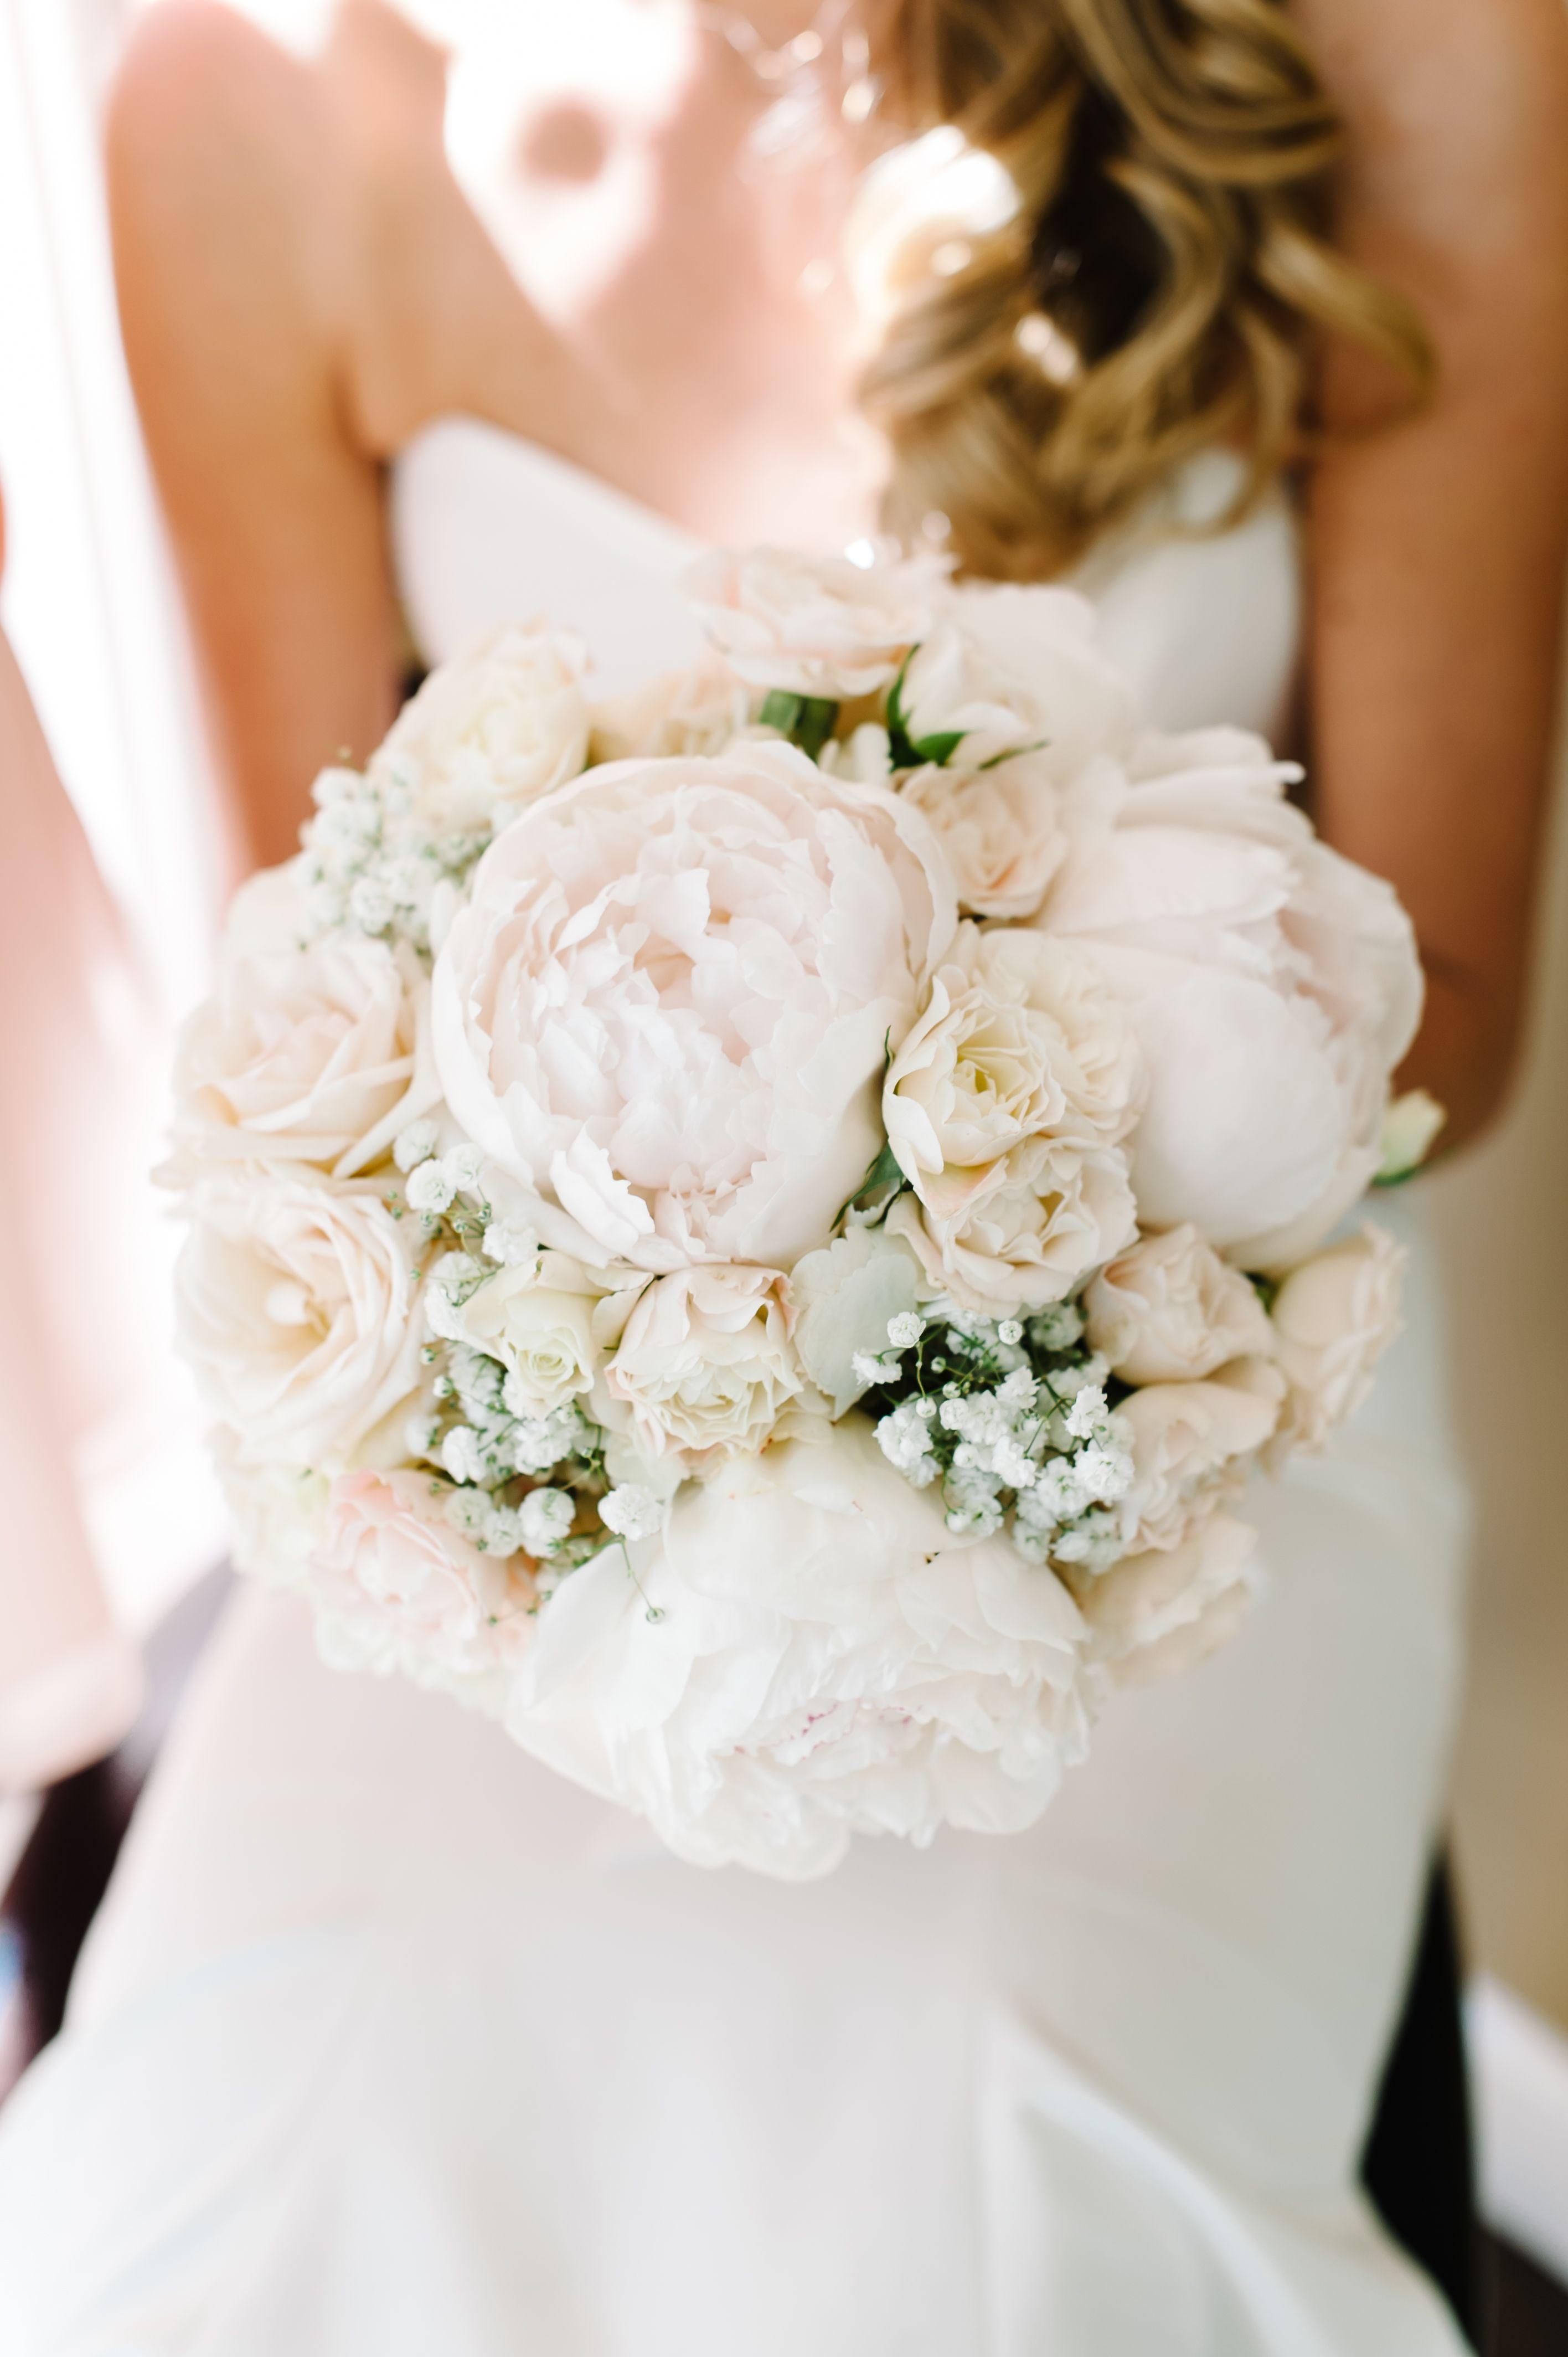 Blush and Gold wedding Decor / Blush and Gold Wedding flowers / hydrangeas, garden roses, roses, peonies, babys breath / bridal bouquet